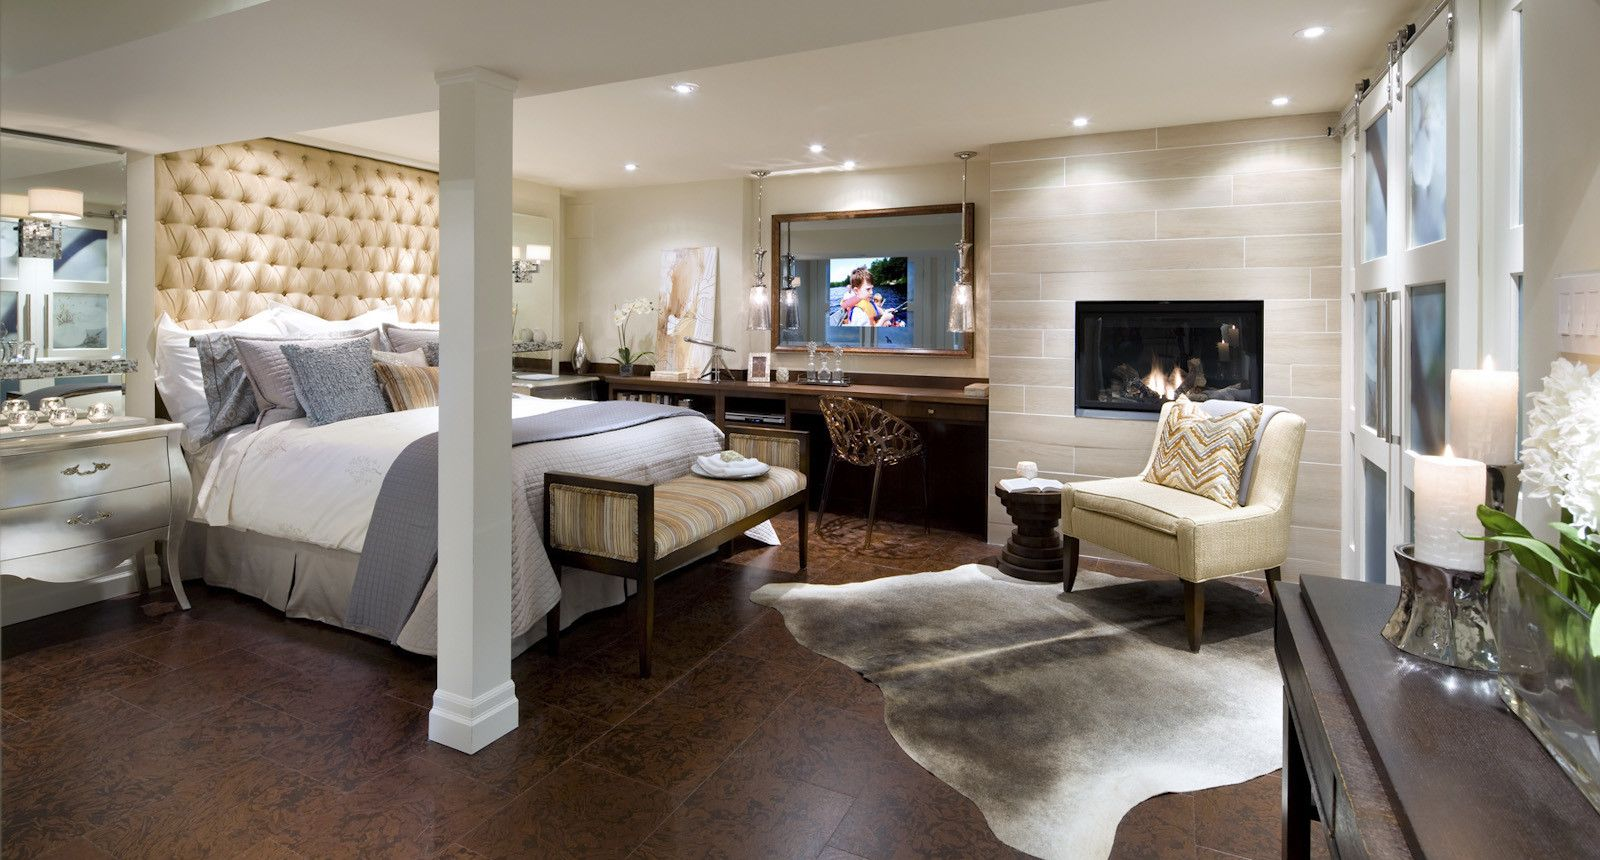 Basement Bedroom Design Beauteous Large Fresh Basement Bedroom In Elegant Design  Basement Remodel Inspiration